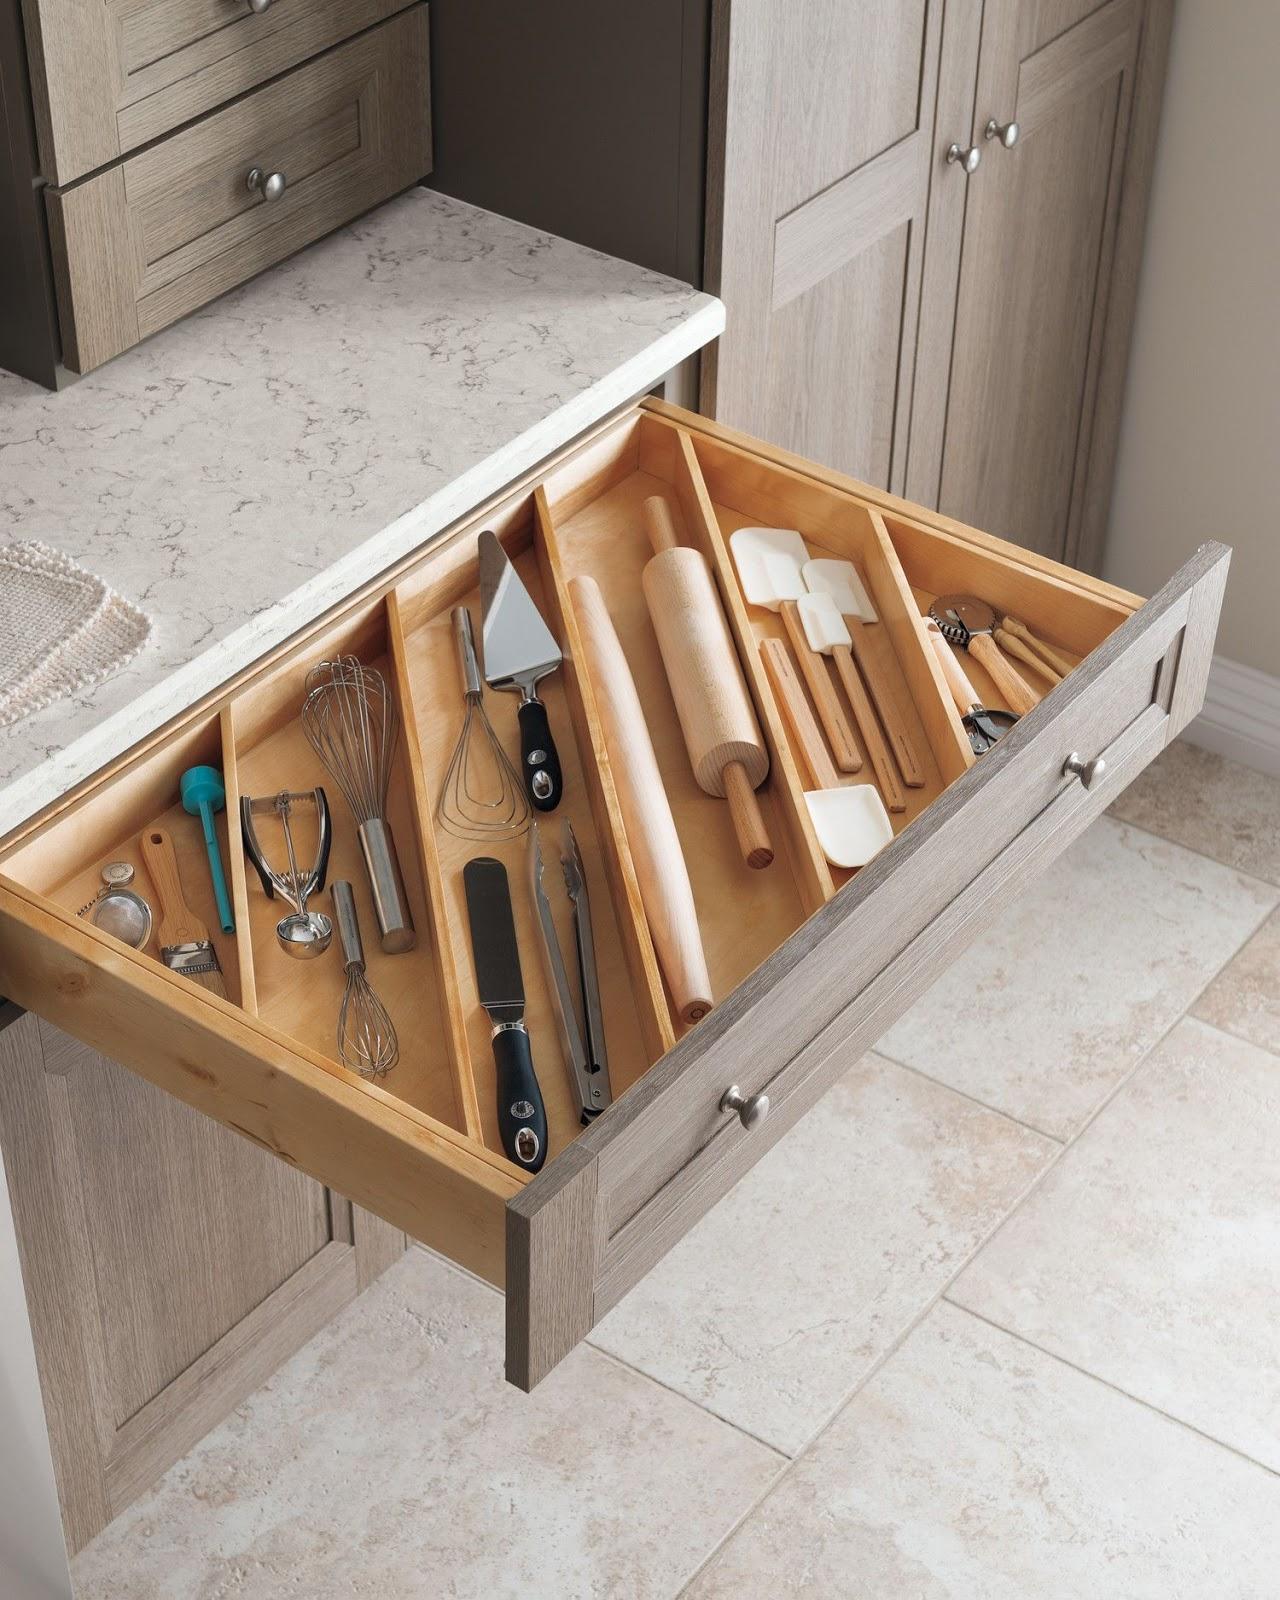 Adorable Kitchen Organization Idea